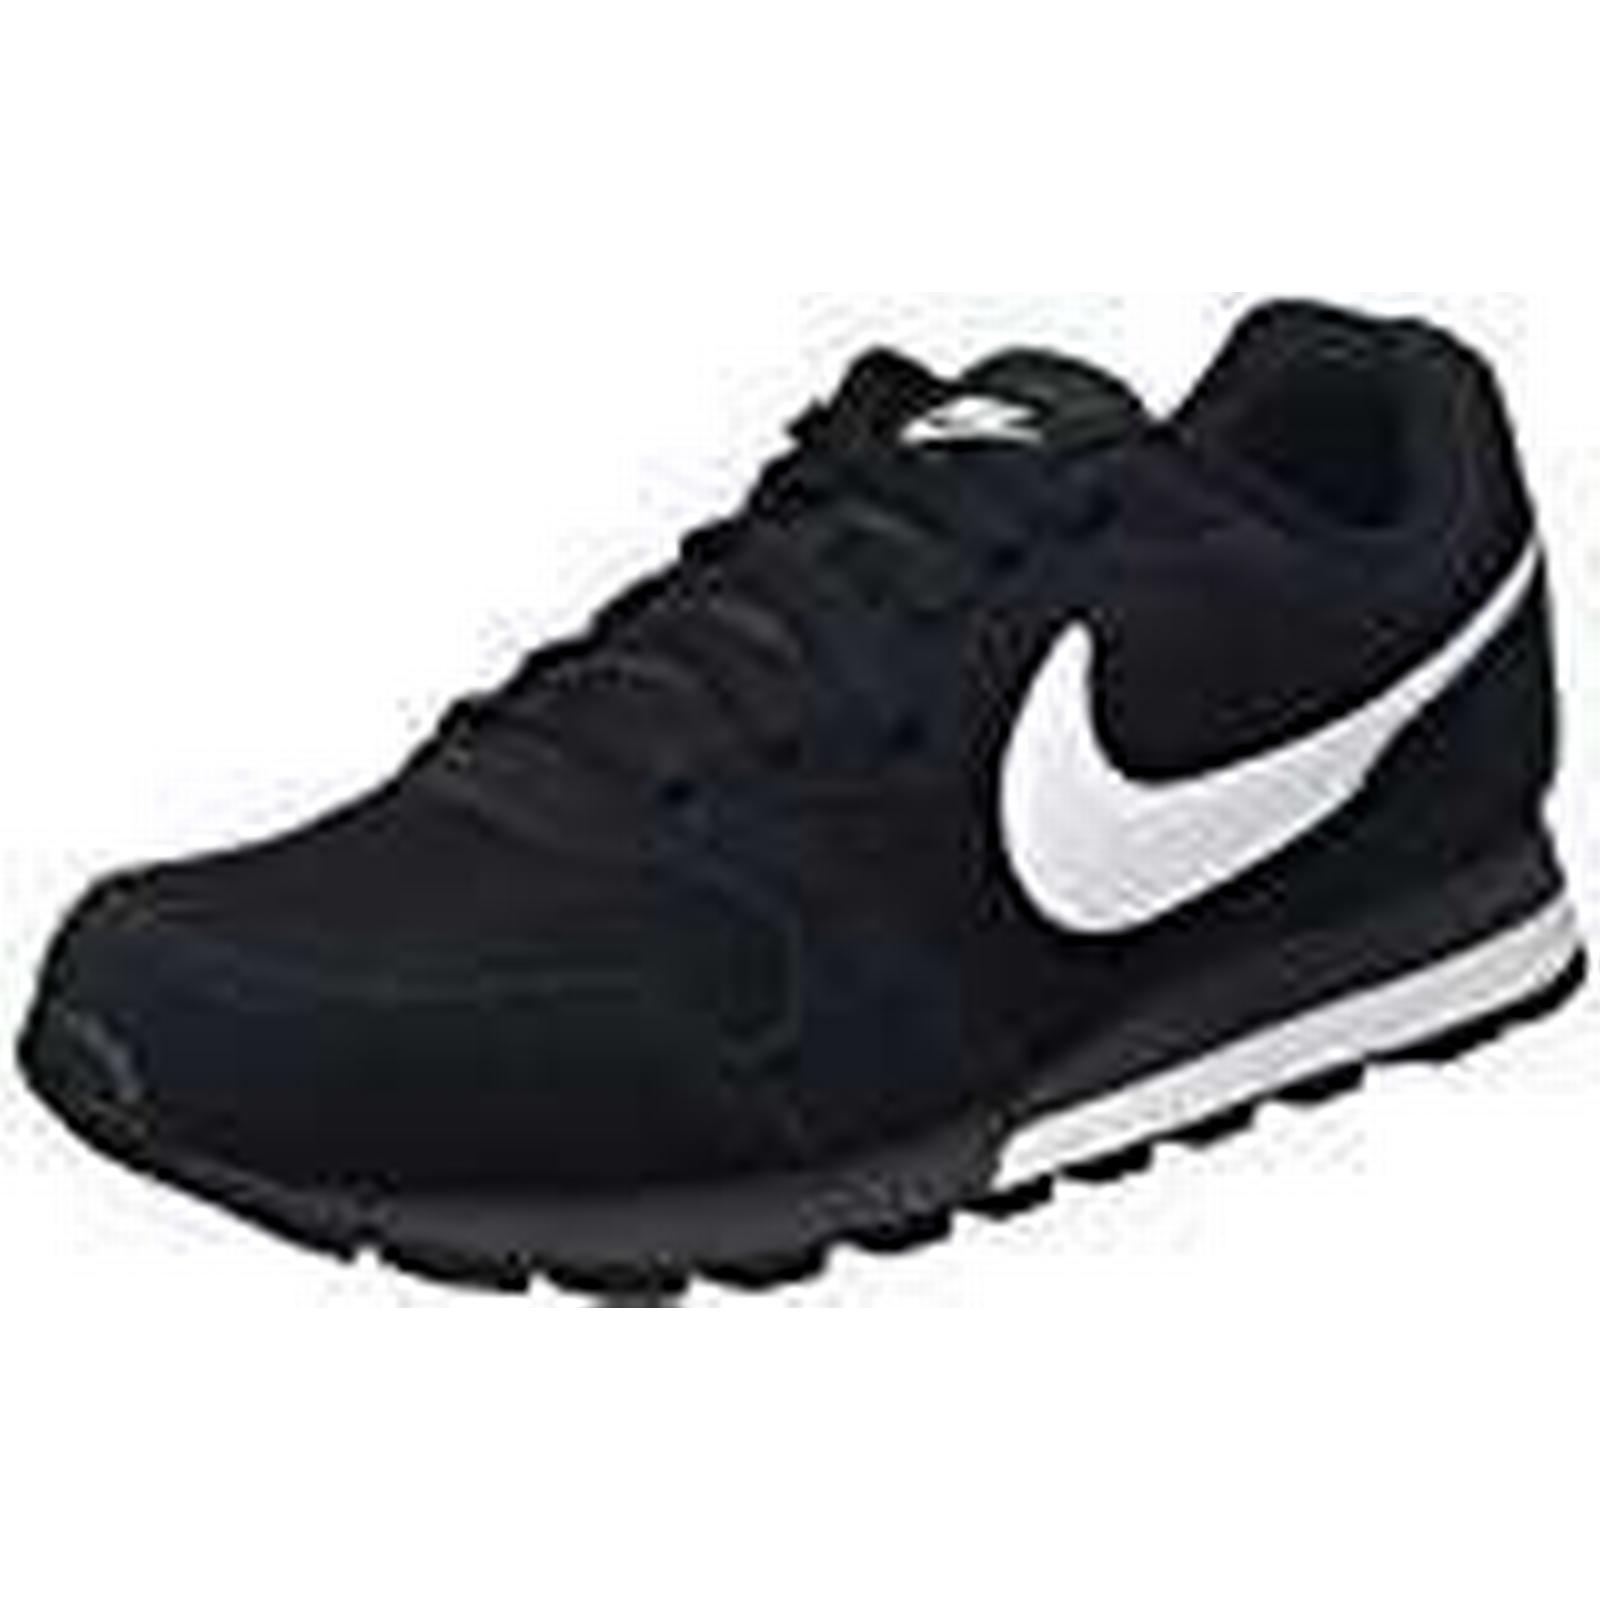 Nike Men's, Sneakers 10 , Black (Black/White-Anthracite 010), 10 Sneakers UK (45 EU) 340780